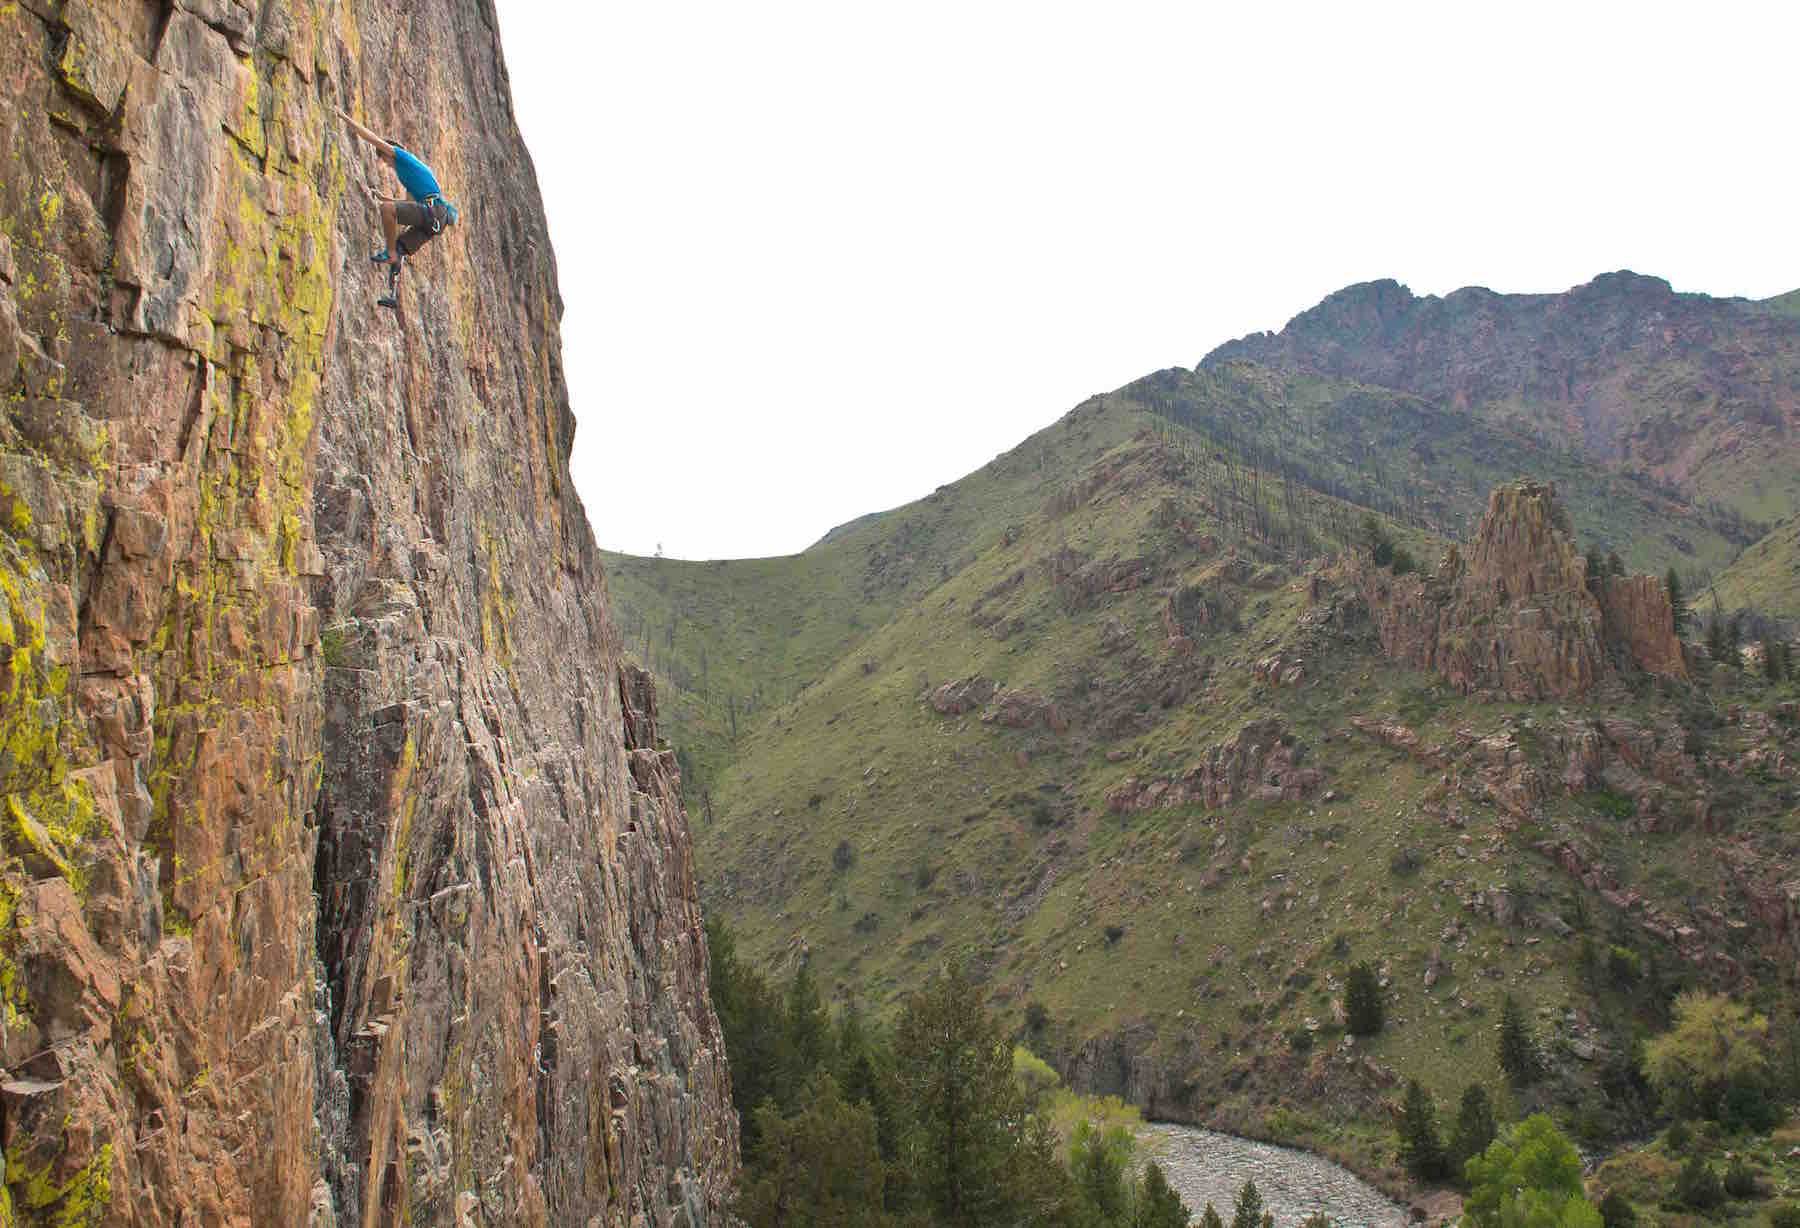 Craig DeMartino climbing